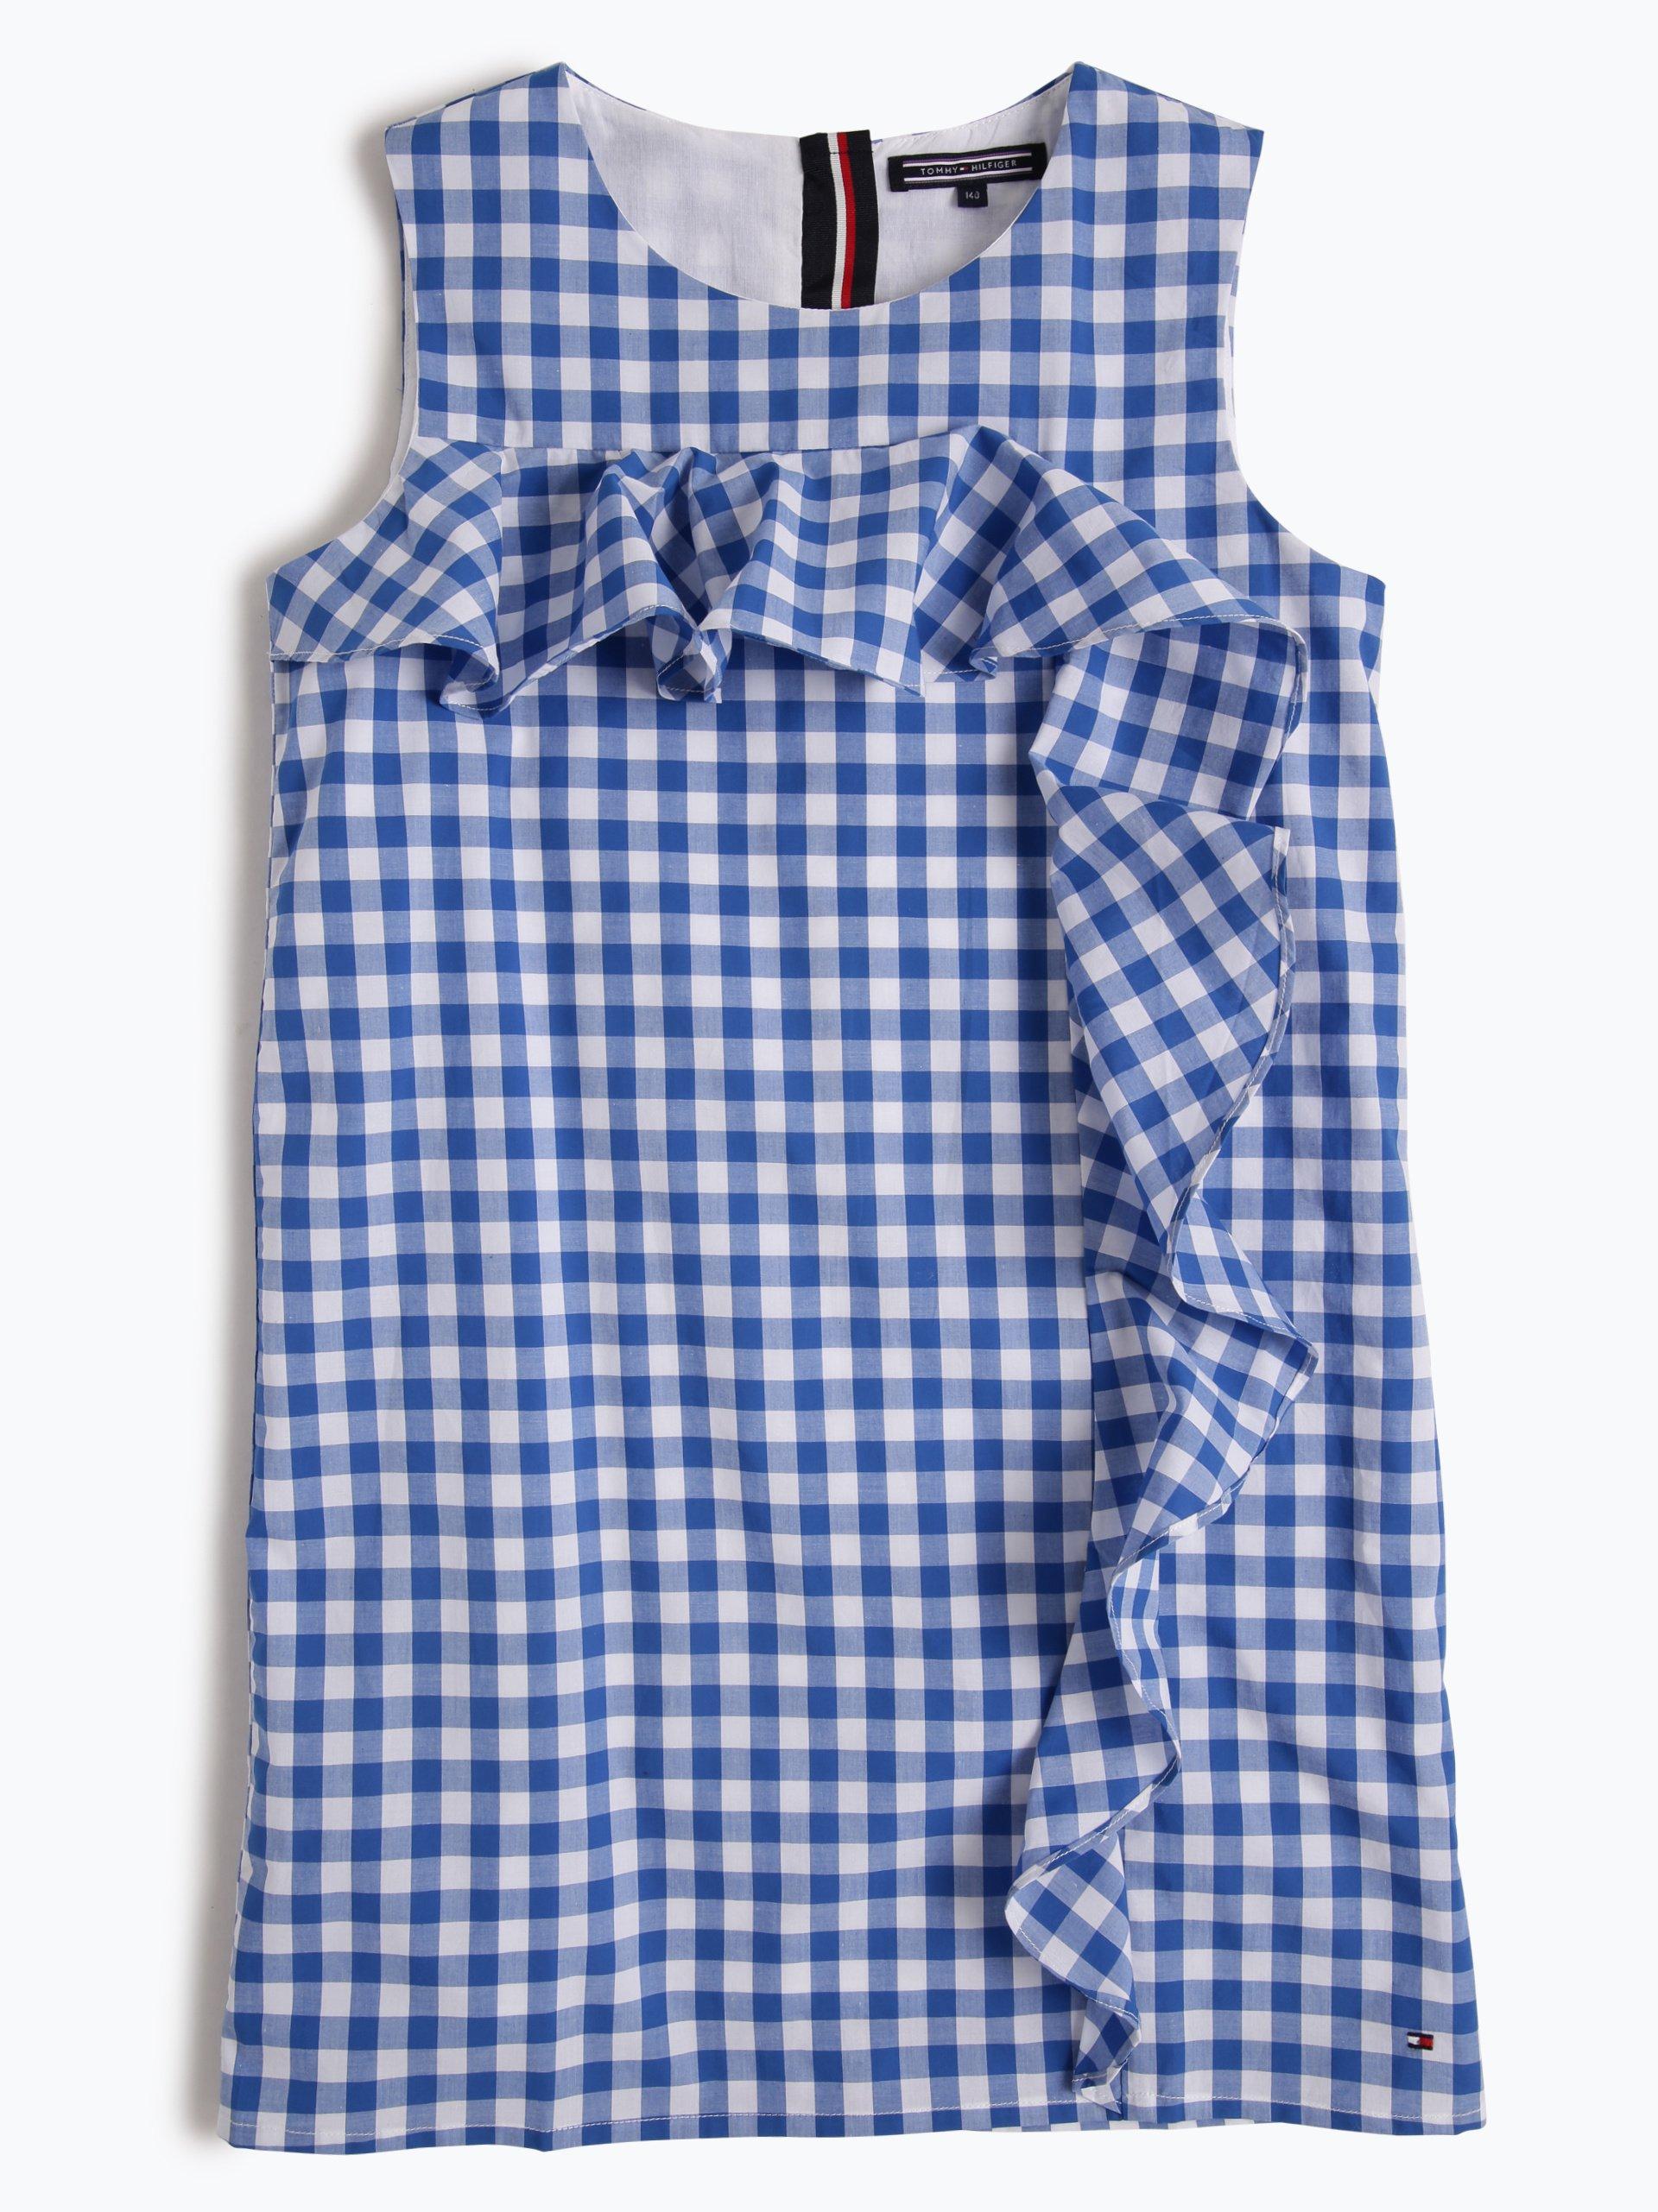 tommy hilfiger m dchen kleid blau uni online kaufen. Black Bedroom Furniture Sets. Home Design Ideas